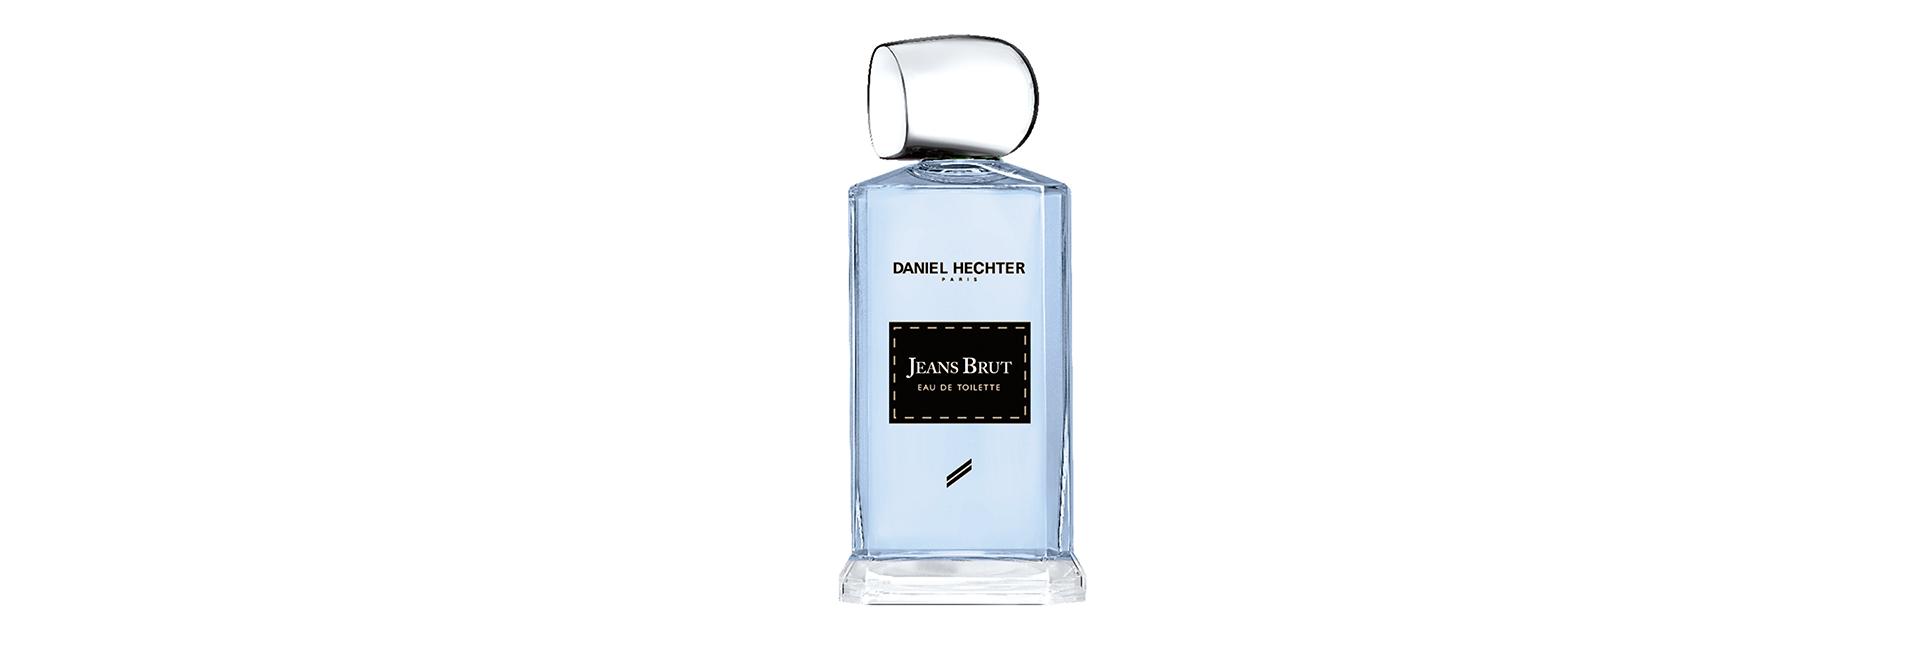 jeans-brut-daniel-hechter-blog-beaute-soin-parfum-homme